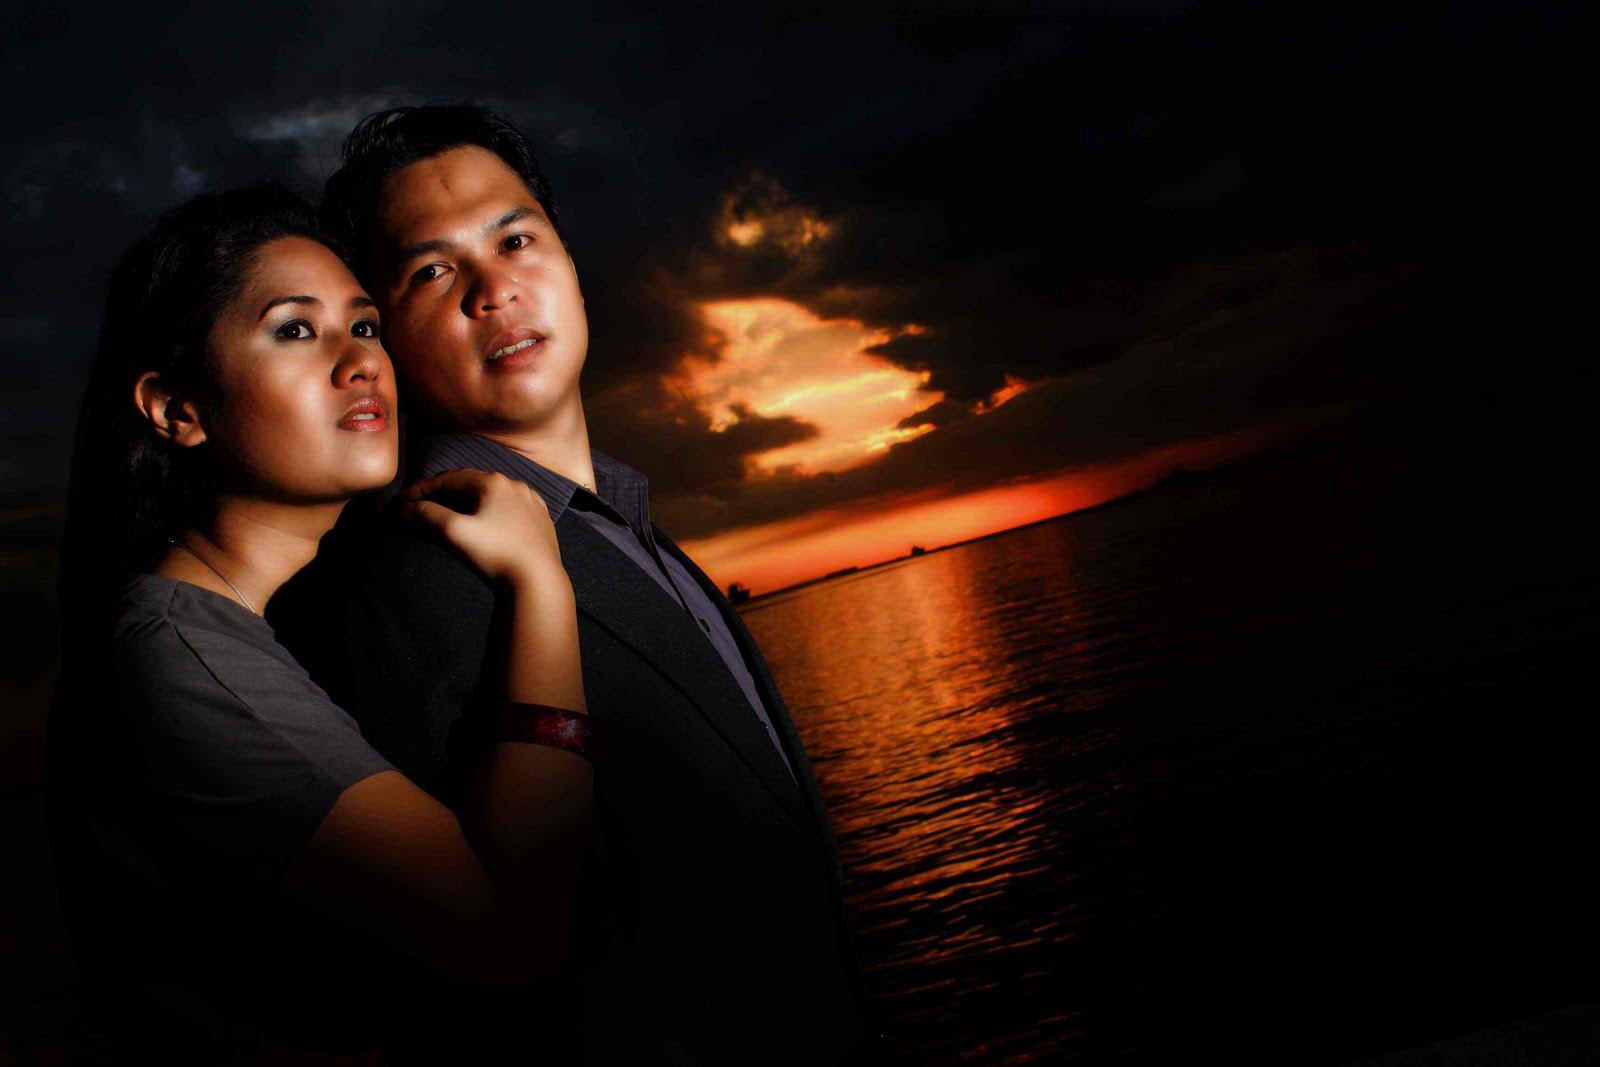 Sunset Pre Nuptial Pictorial Wedding Photographer Manila